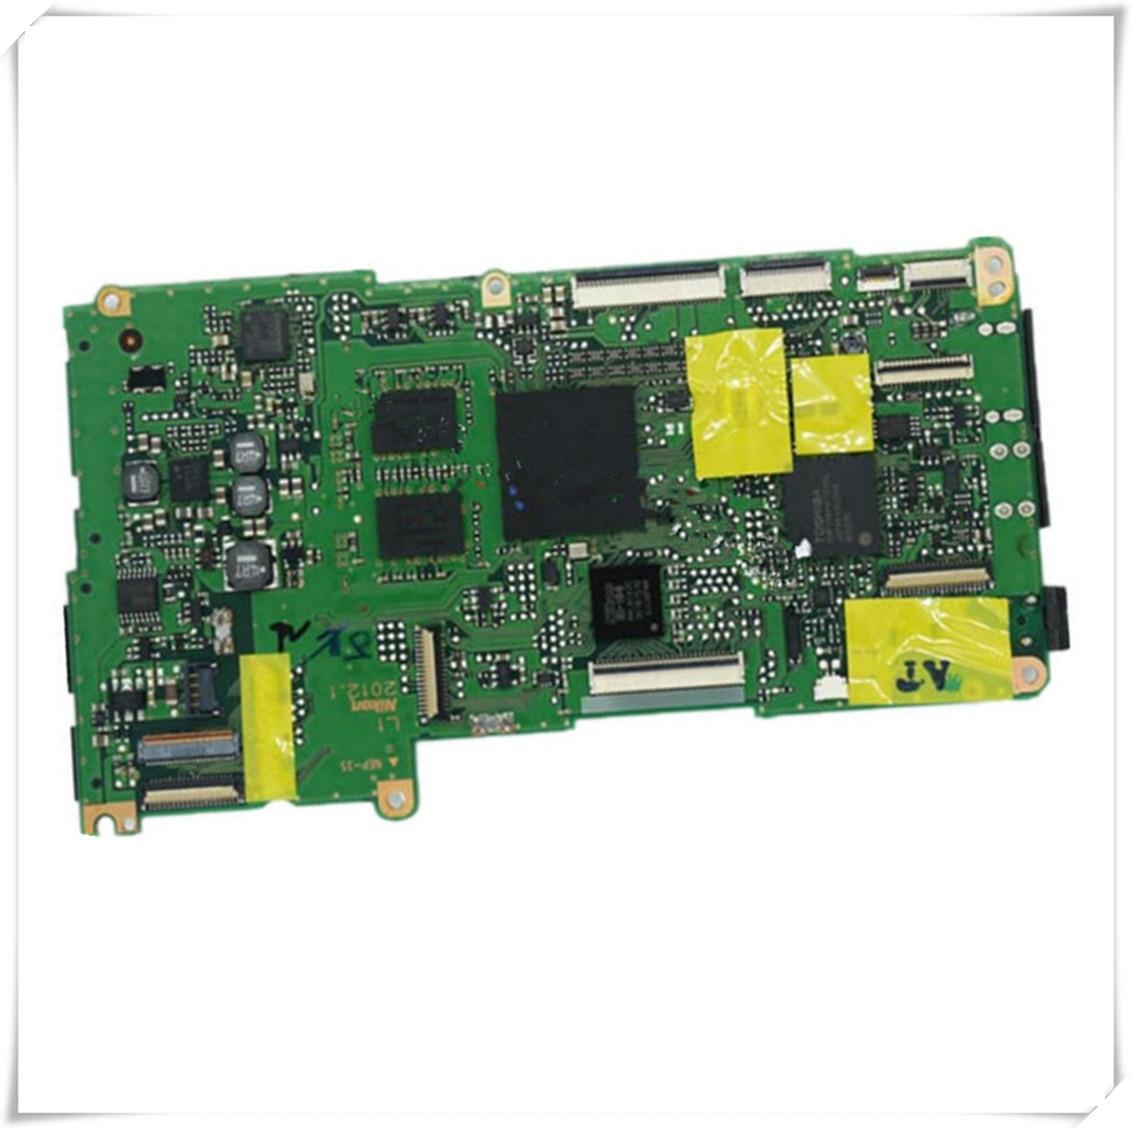 100% original motherboard for nikon D600 mainboard D600 main board dslr Camera repair parts free shipping100% original motherboard for nikon D600 mainboard D600 main board dslr Camera repair parts free shipping